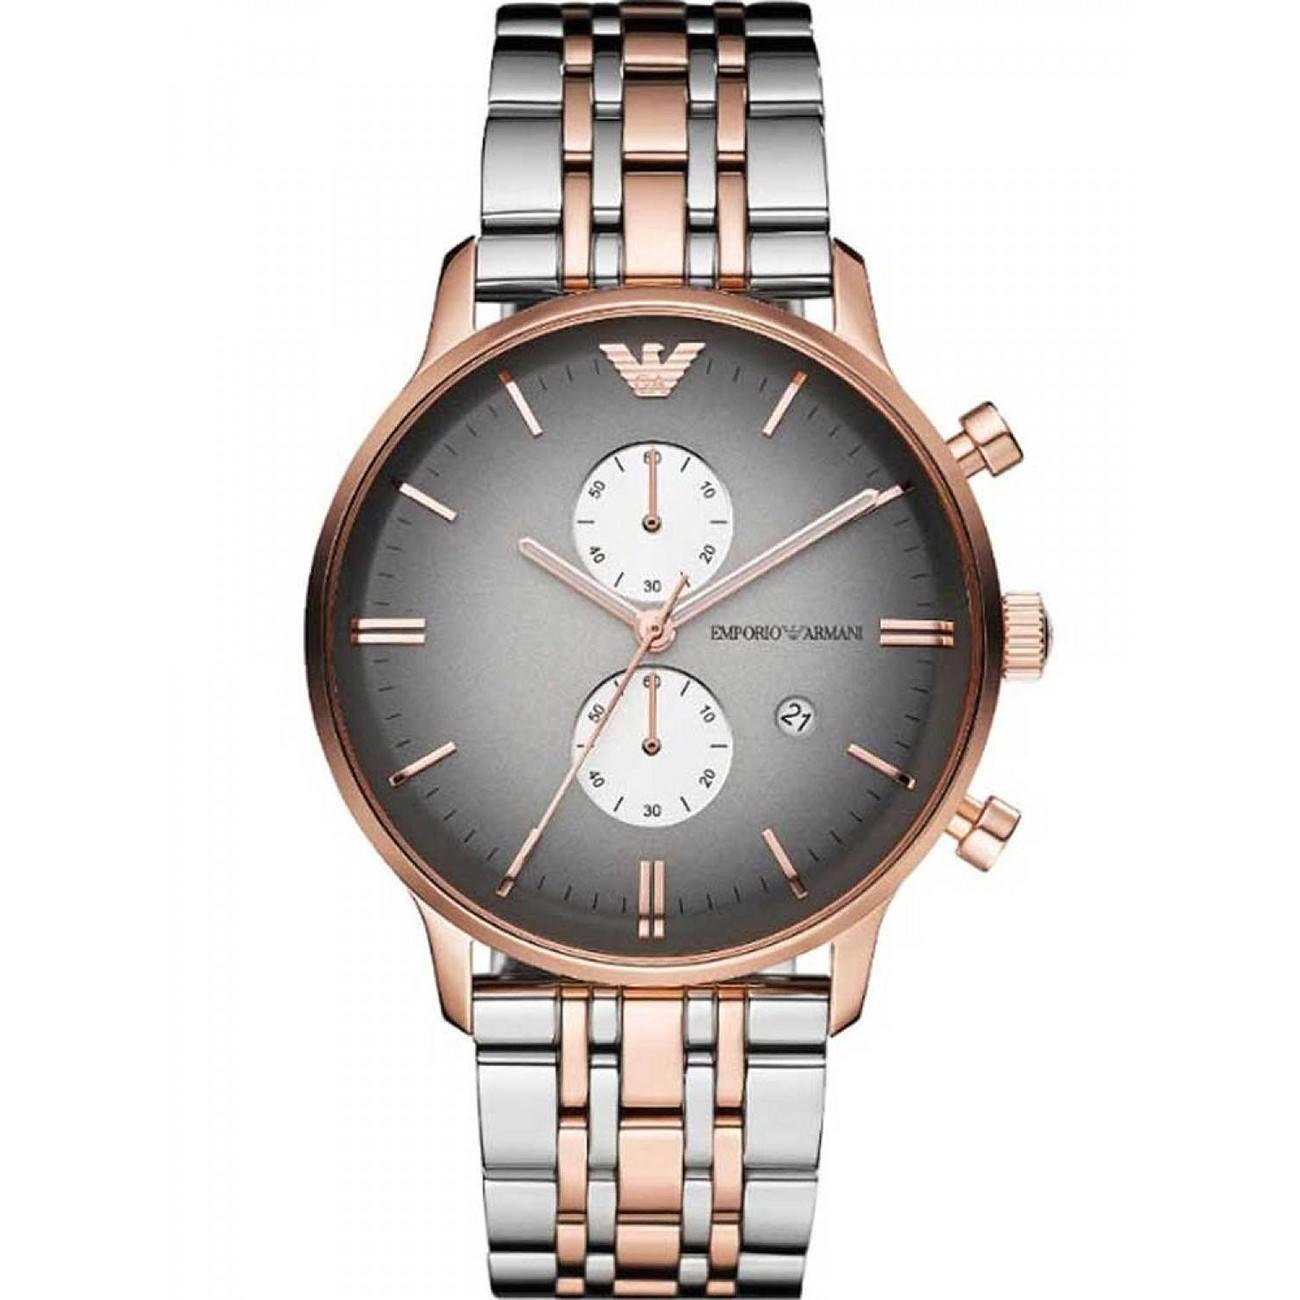 Часы emporio armani solid stainless steel 50 meters официальный сайт